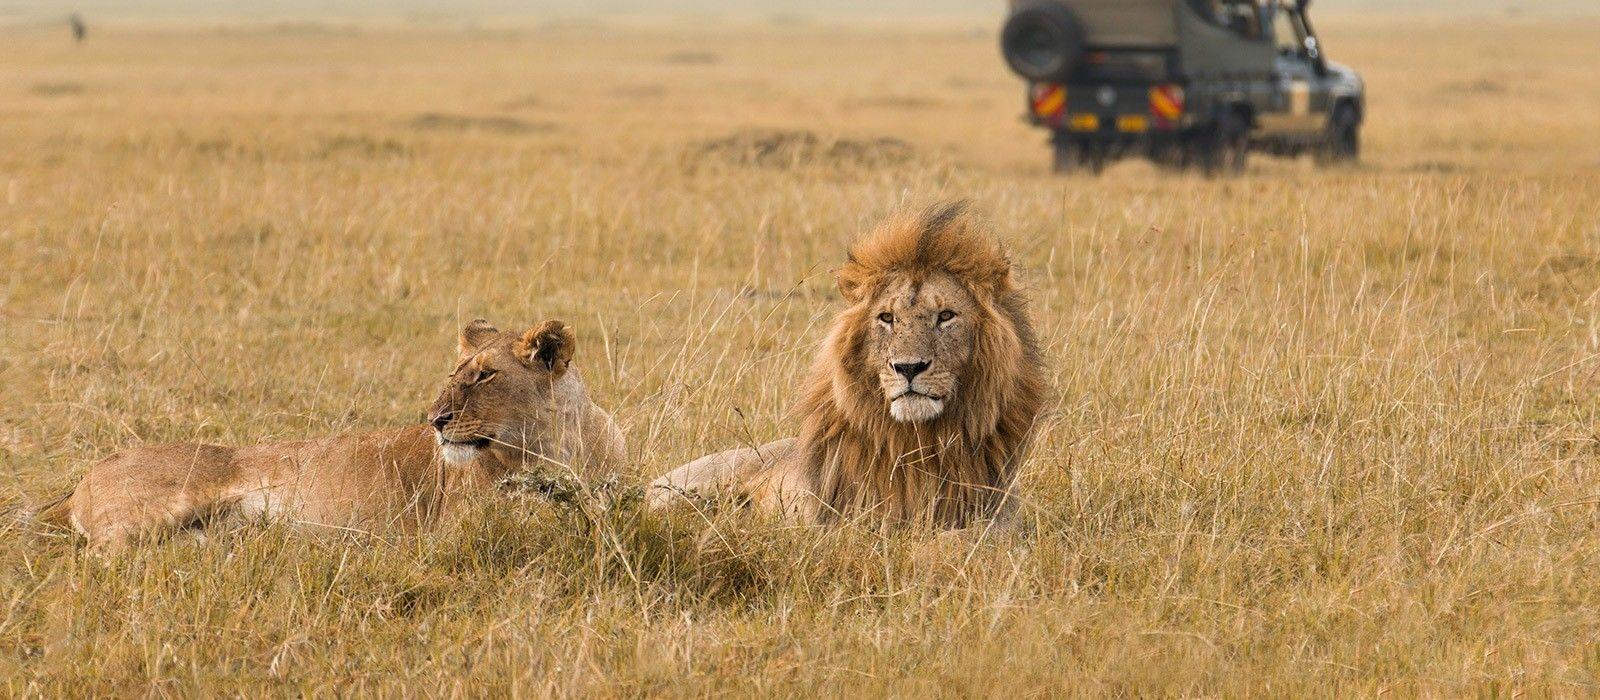 Kenia & Sansibar Reise: Safaris & Strände Urlaub 4